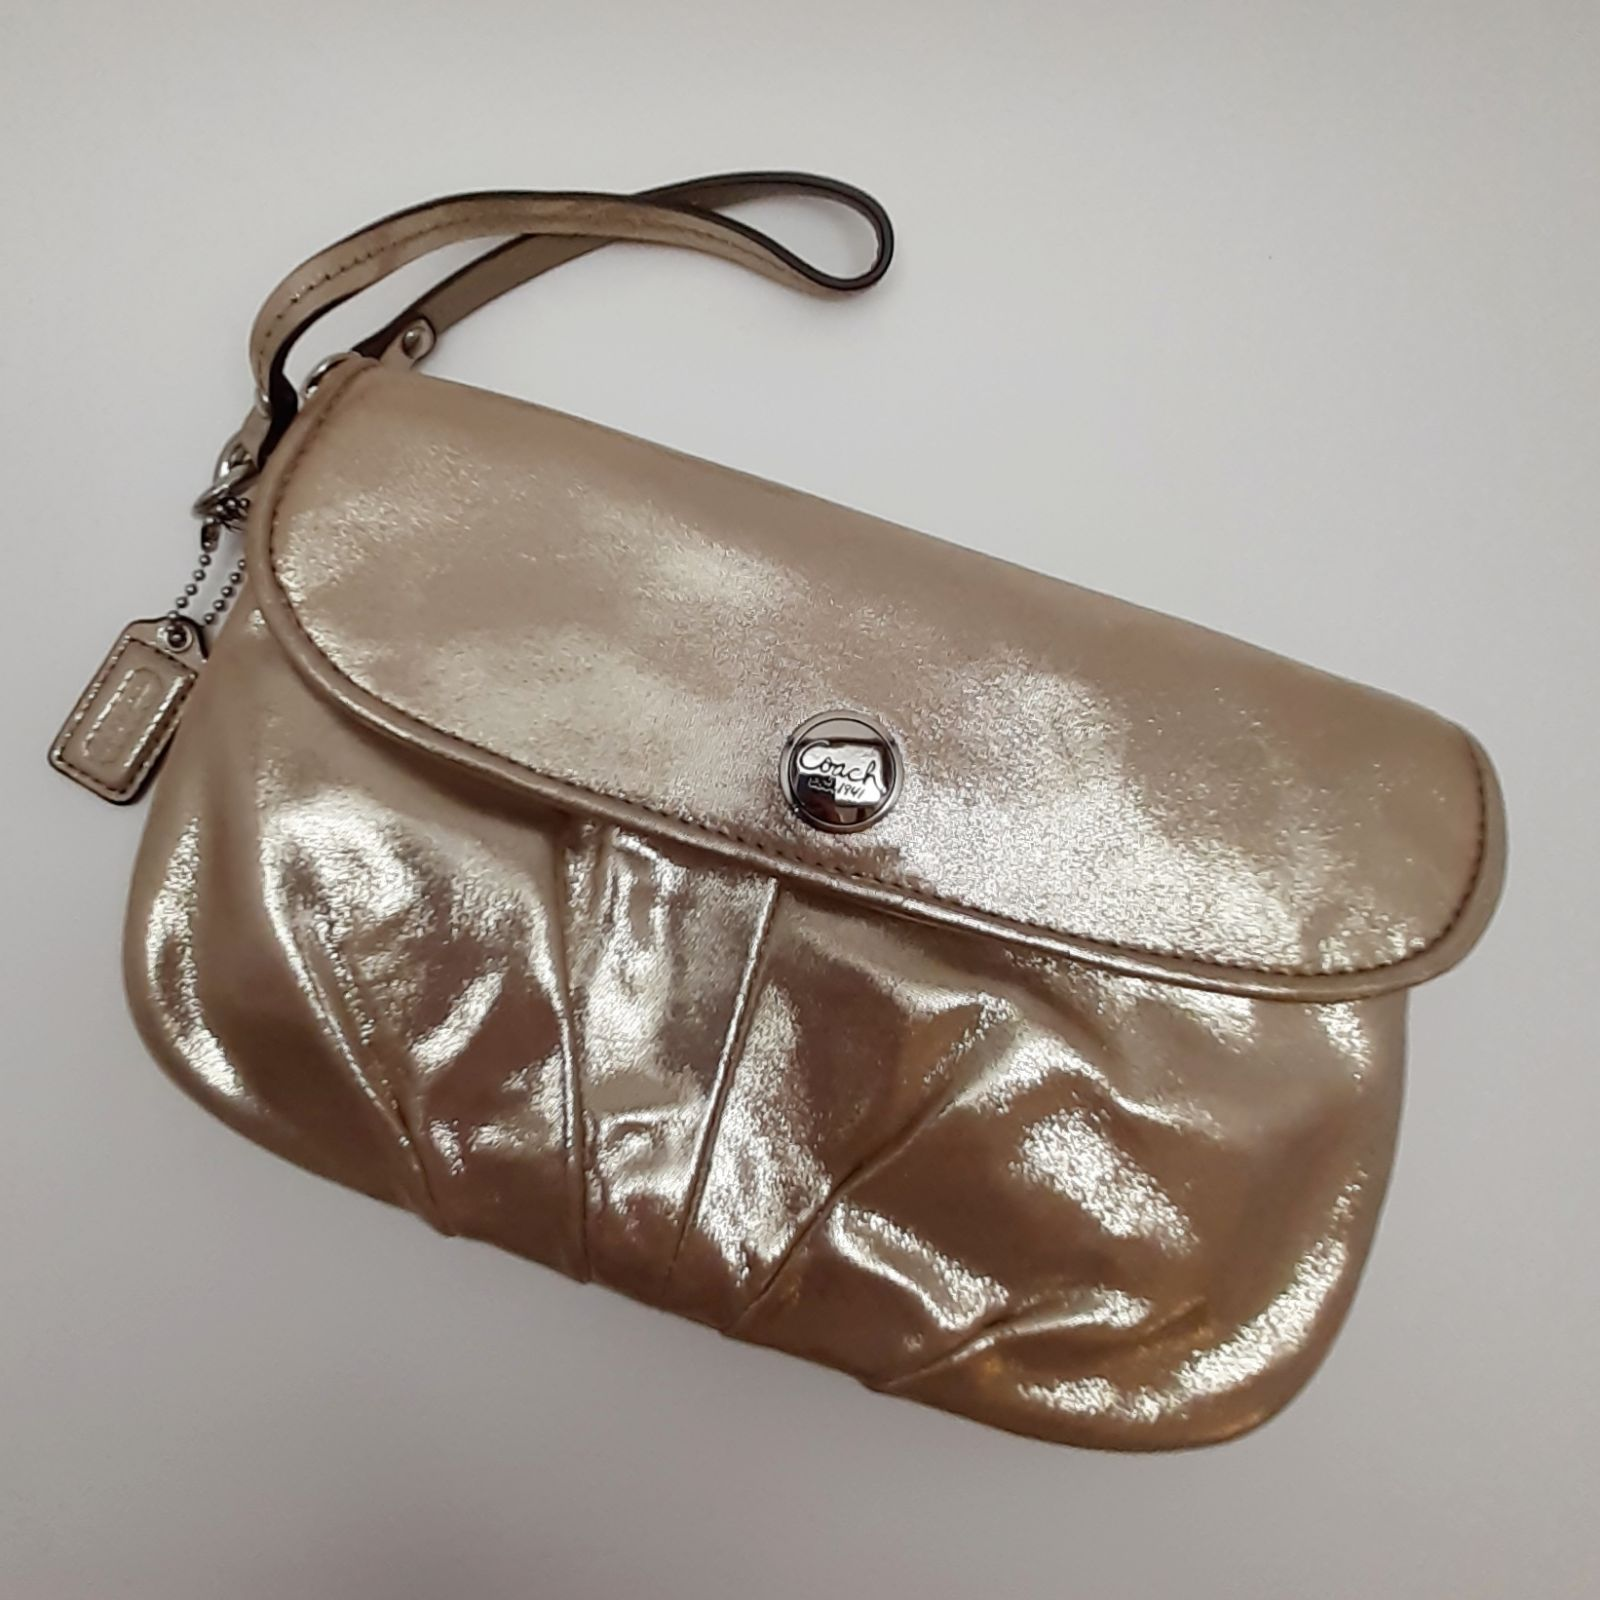 Coach Metallic Wristlet/Clutch Bag